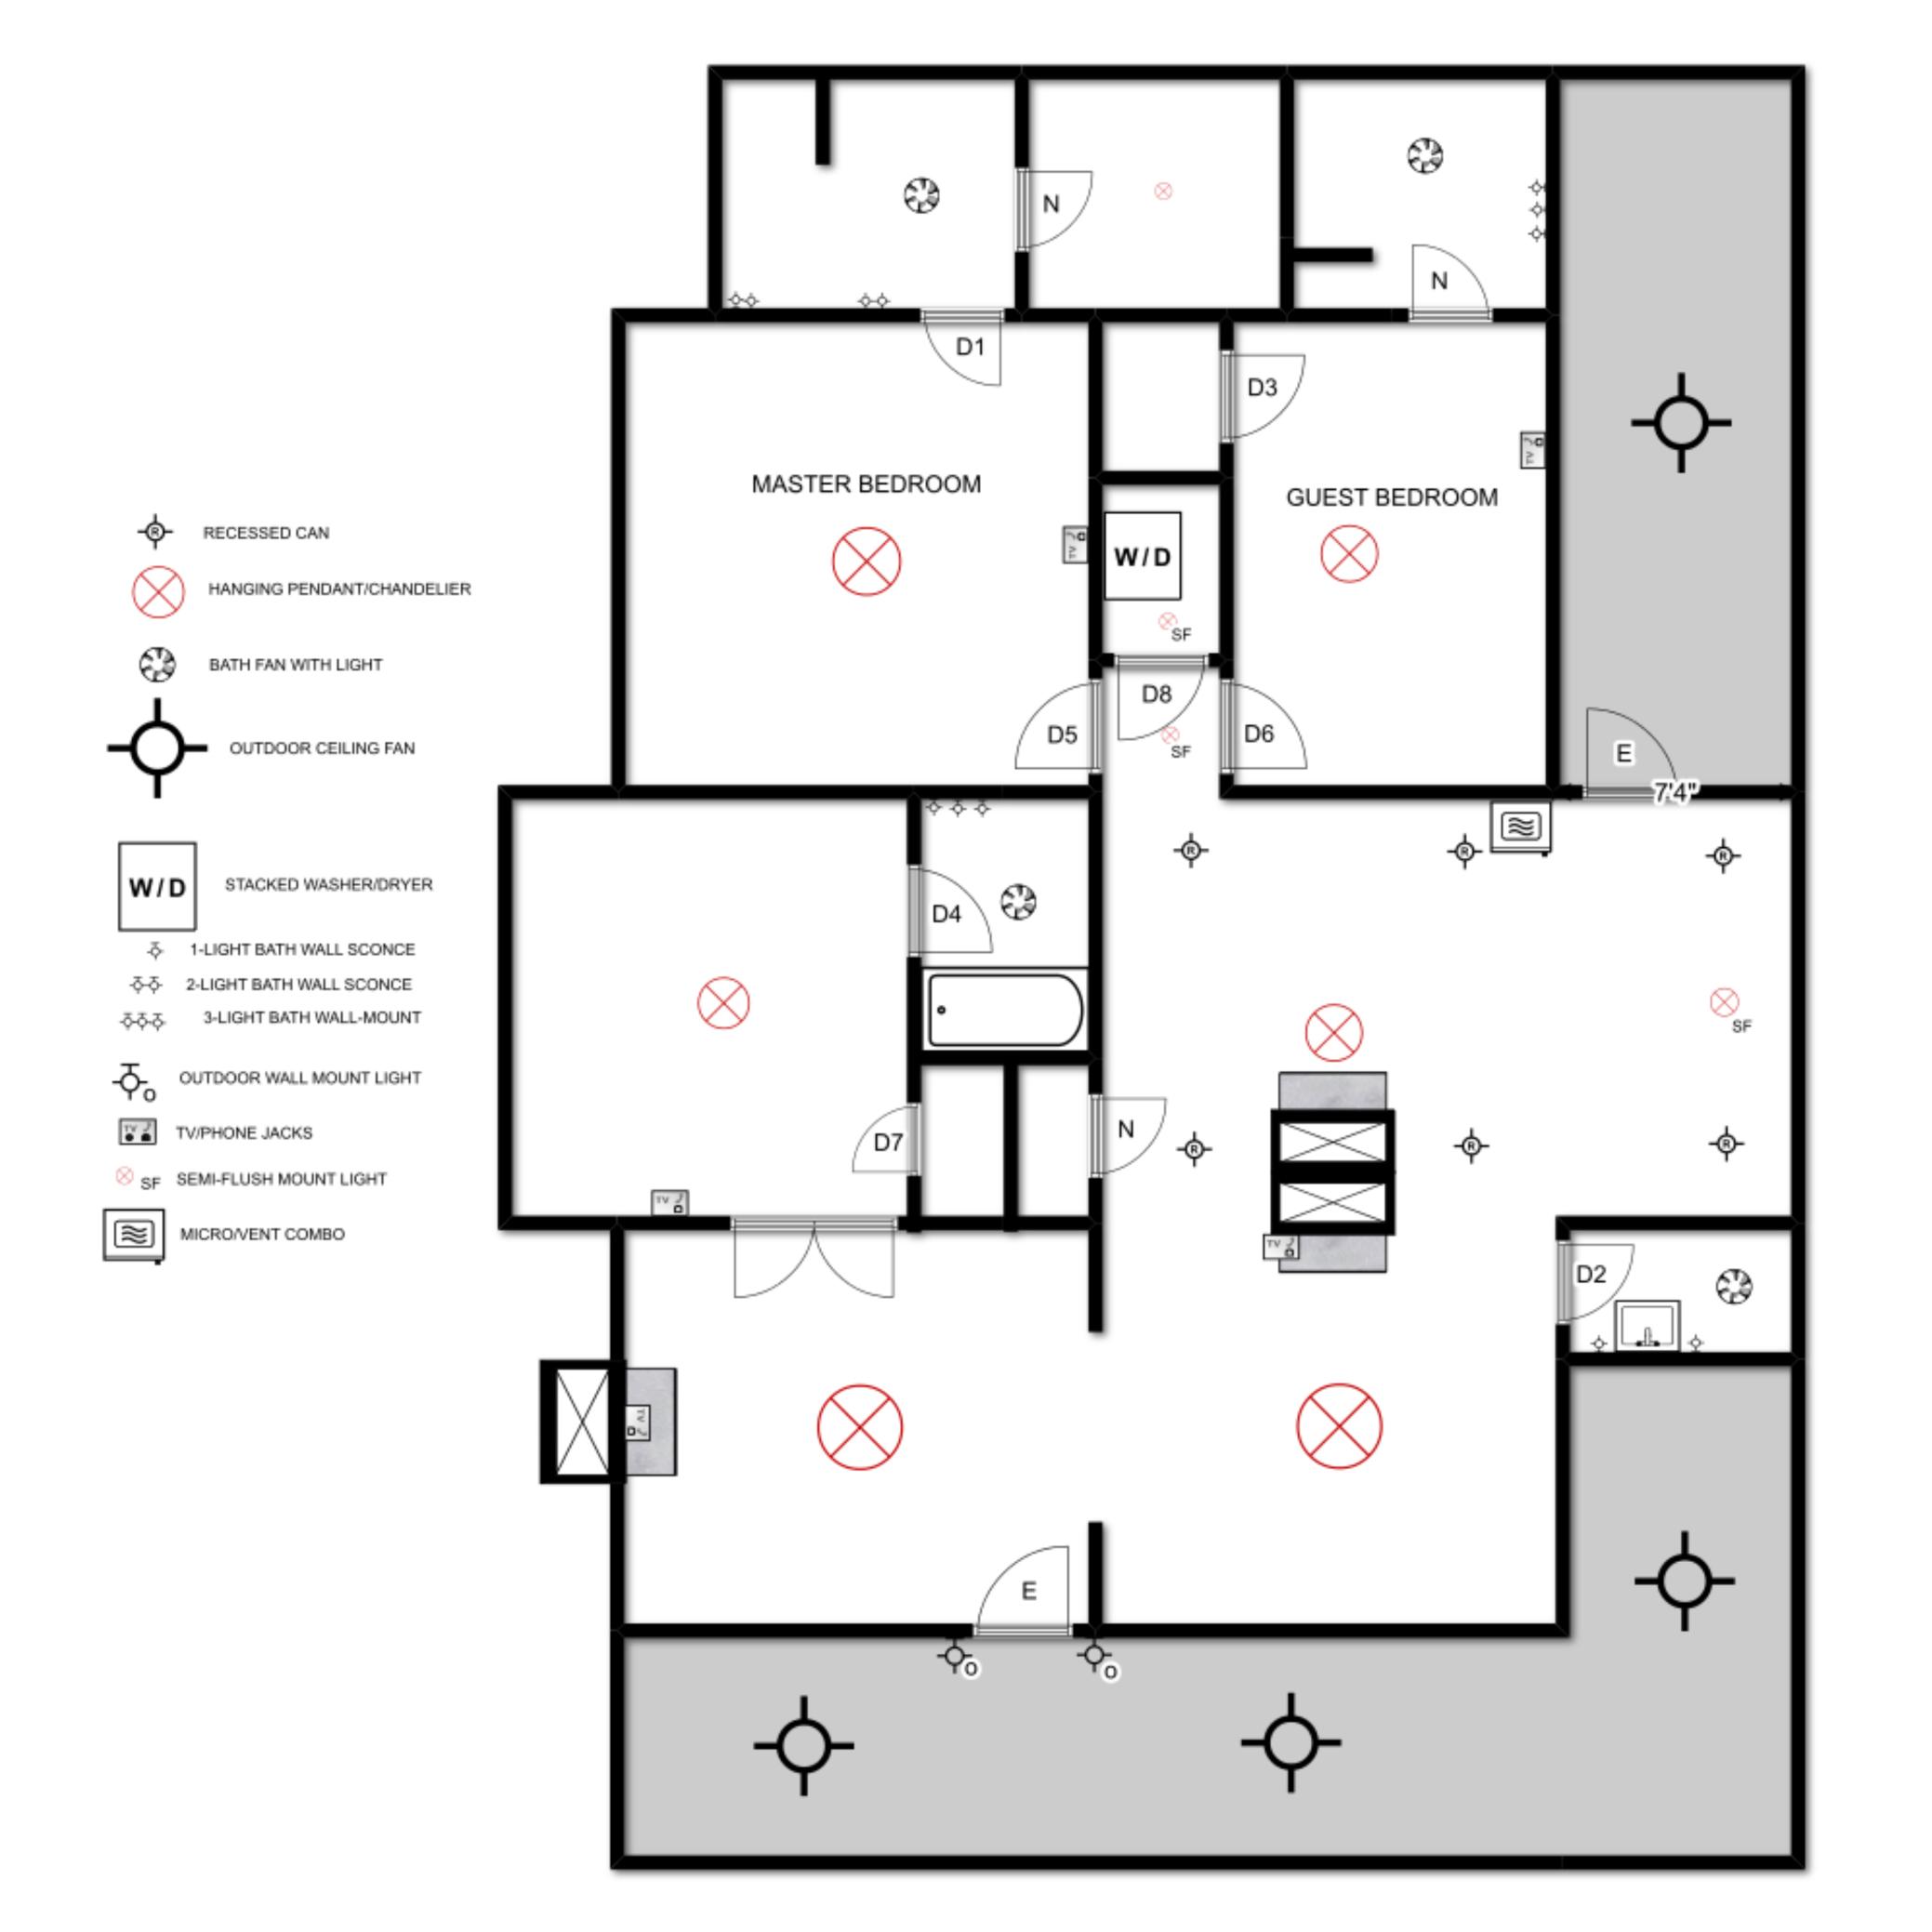 small resolution of elizabeth burns design electrical plan format 1500w